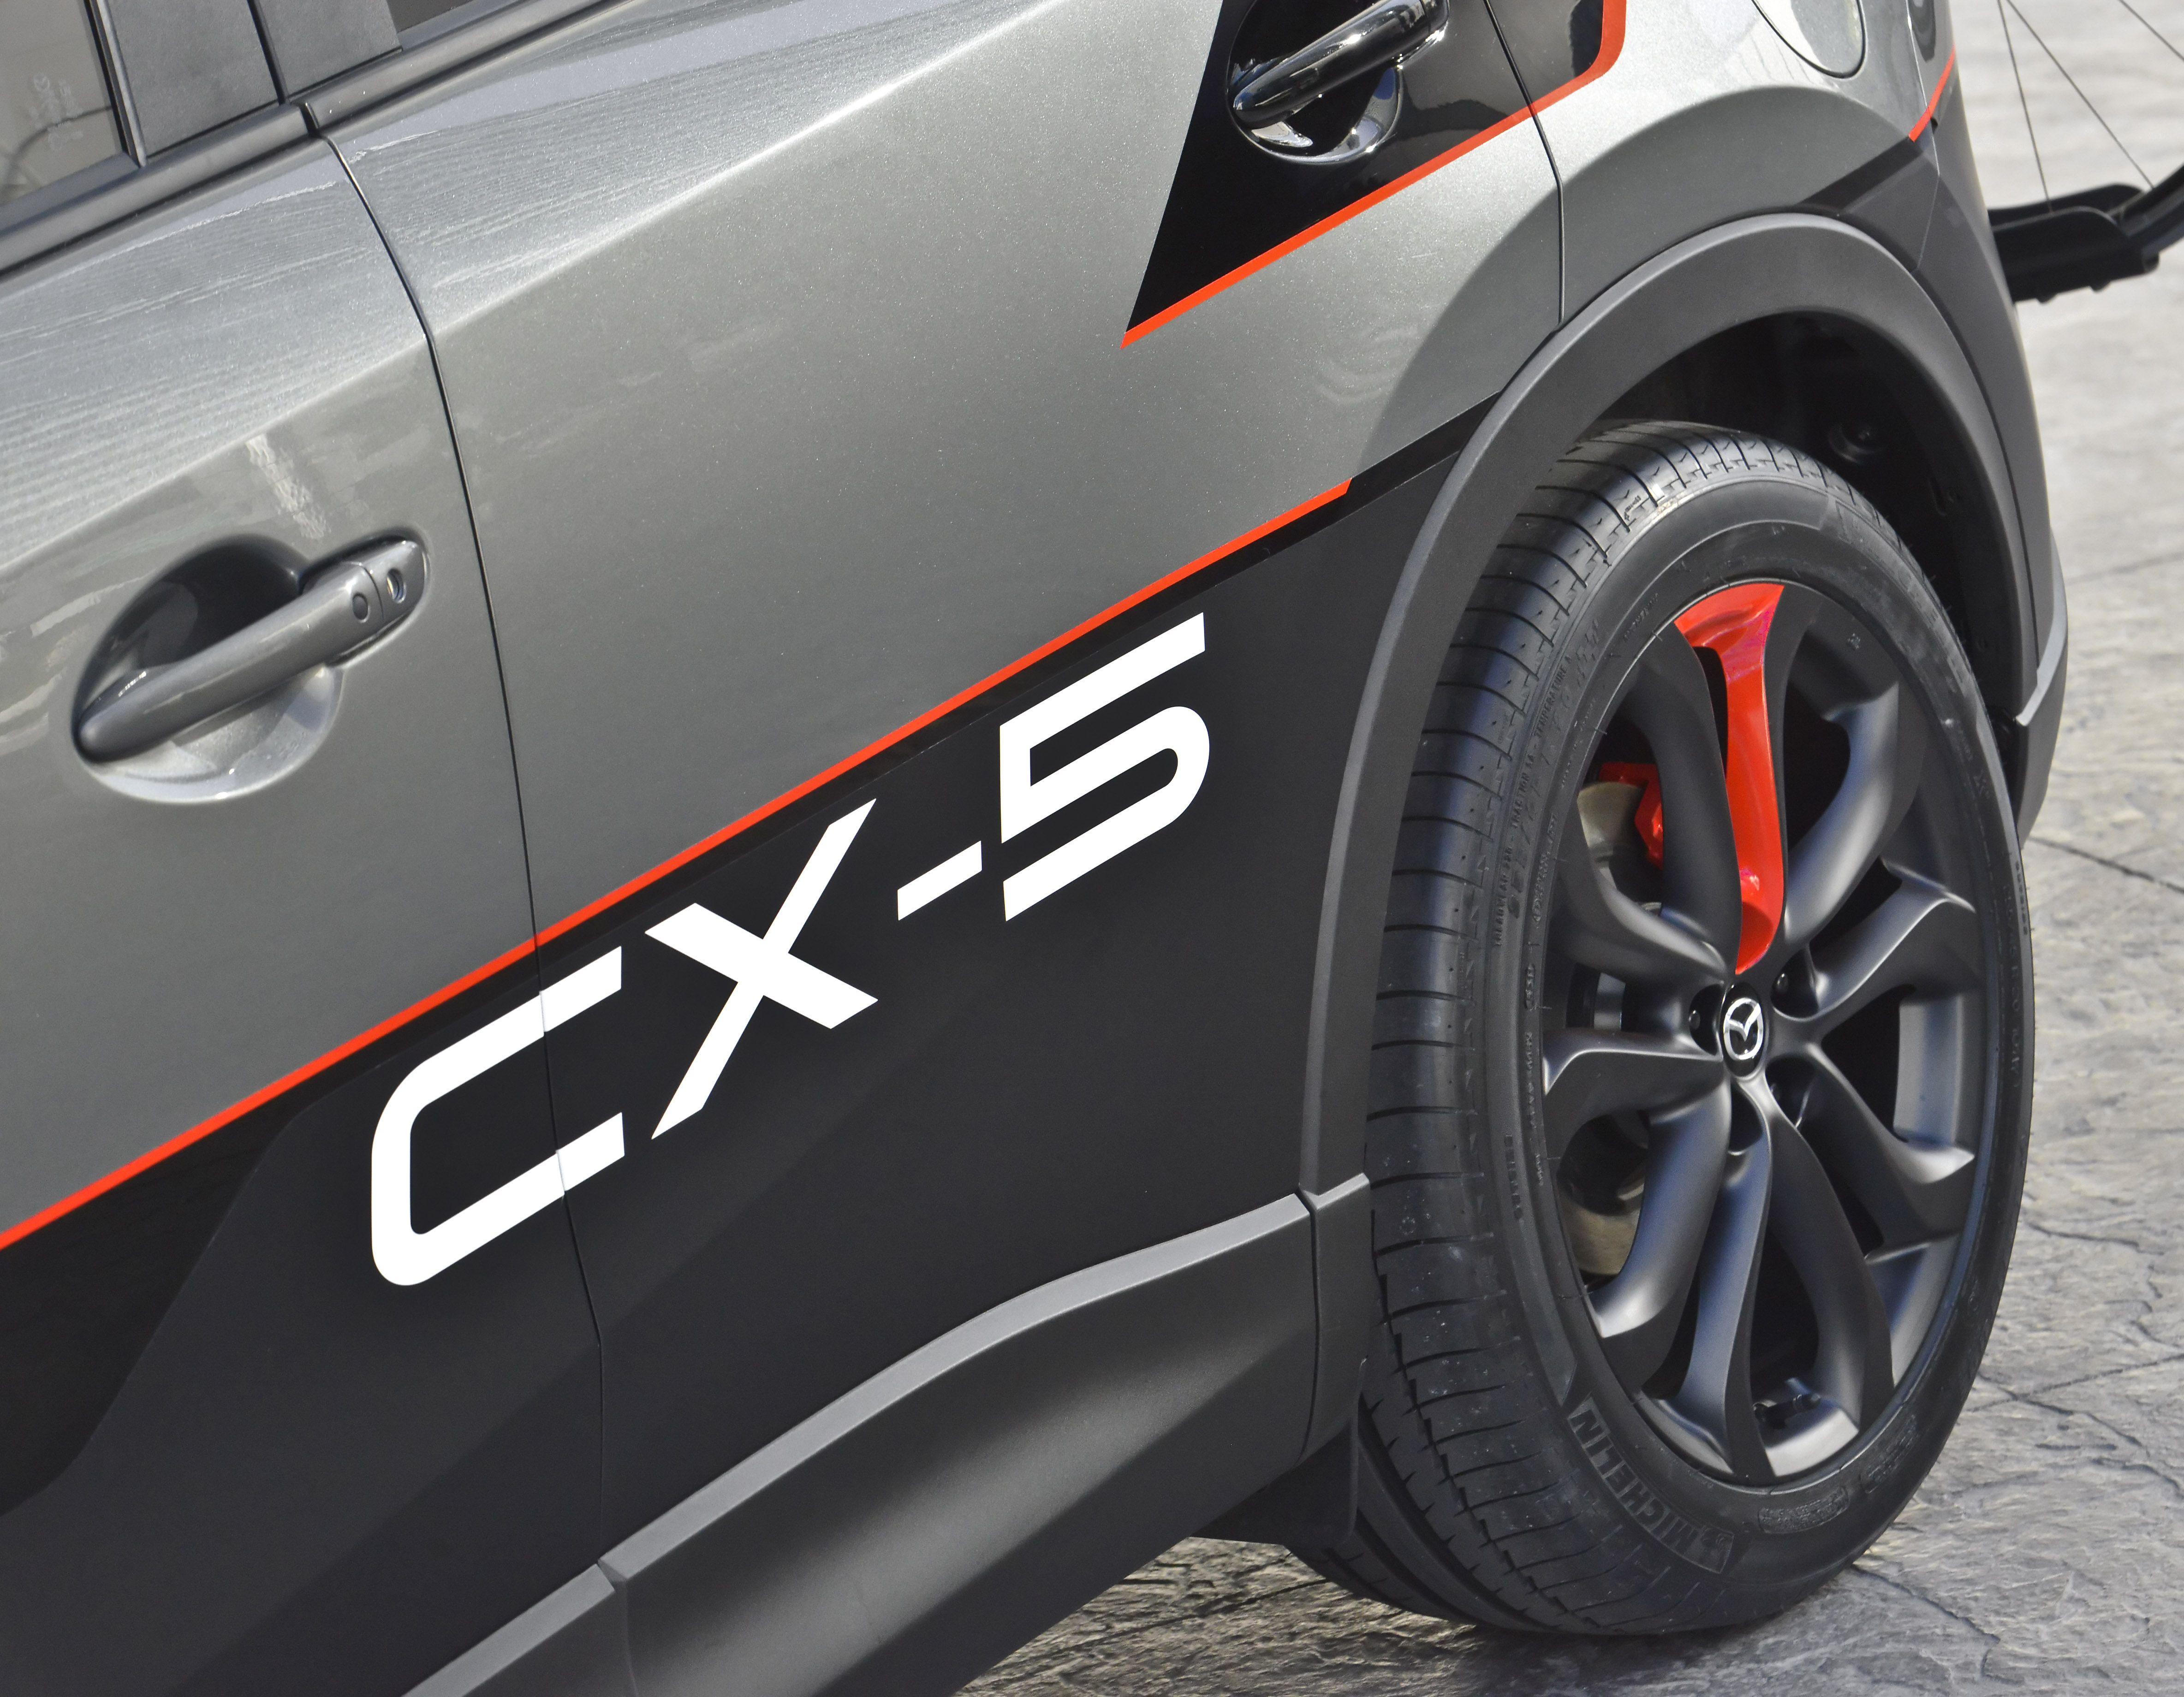 54 best mazda cx 5 images on pinterest mazda cx5 cars and mazda